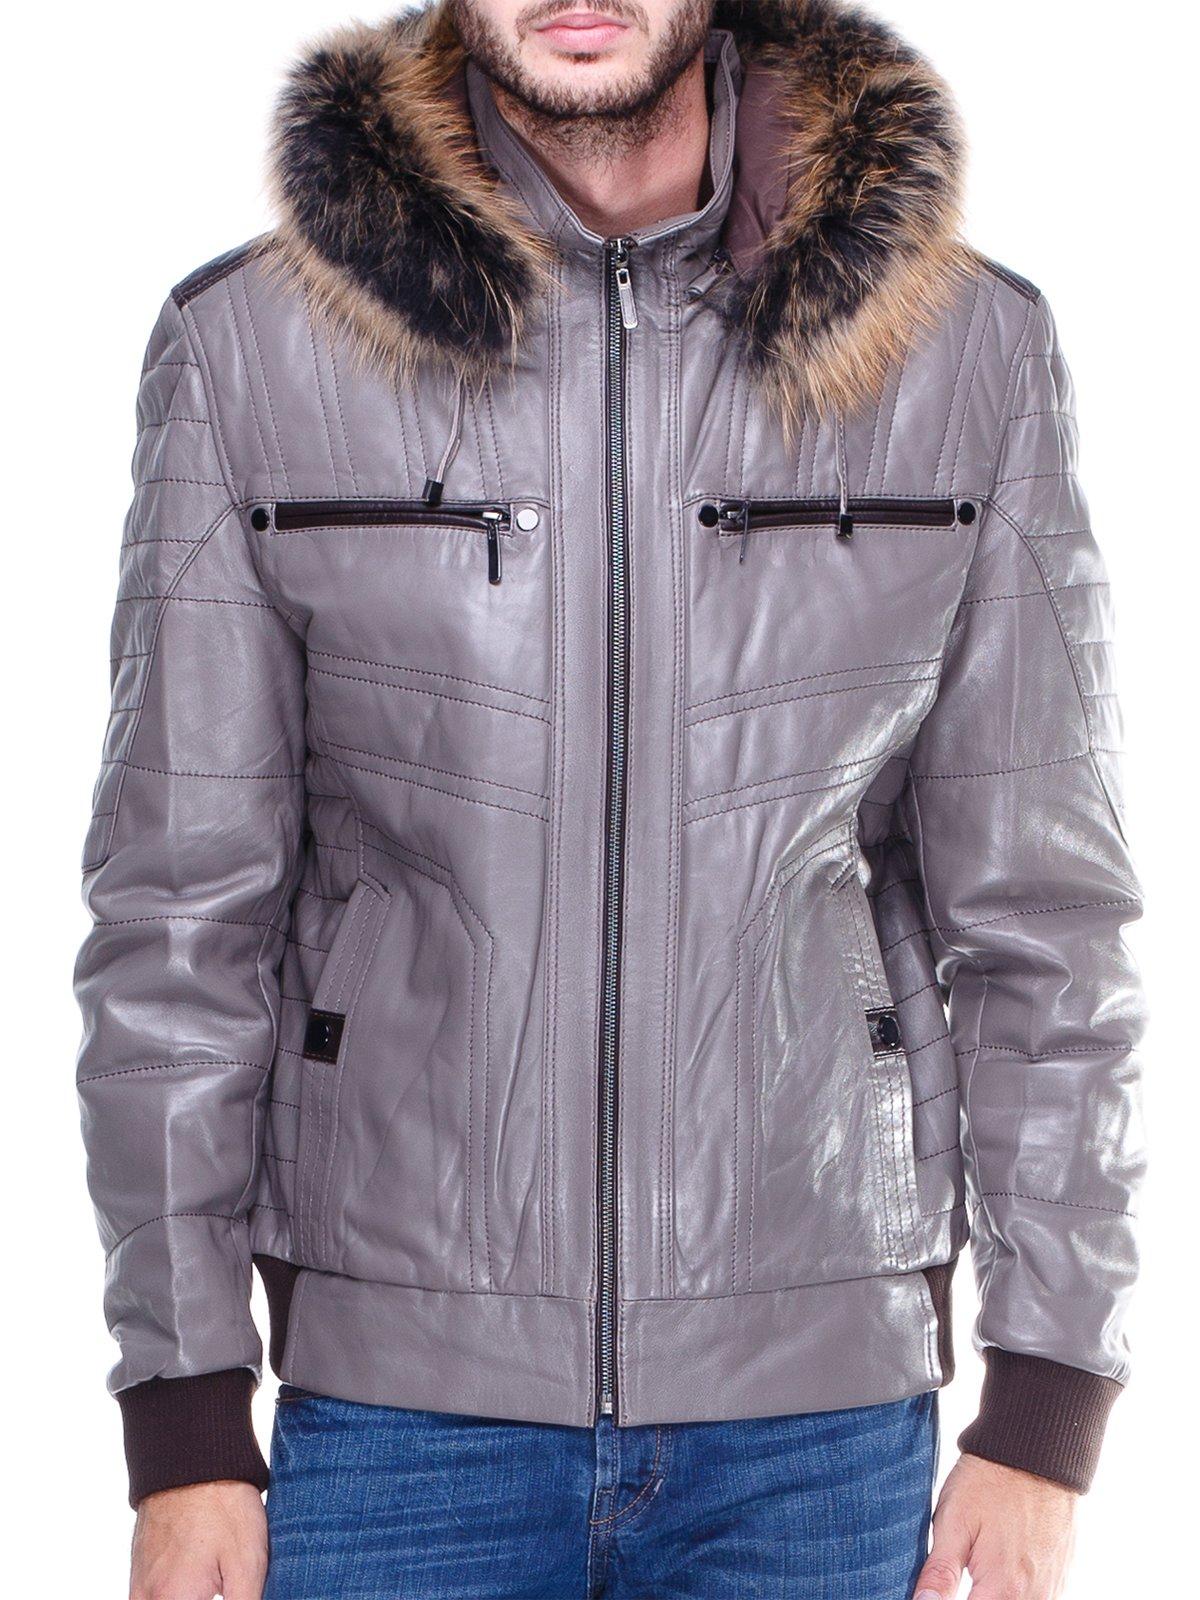 Куртка сіра з оздобленим хутром капюшоном   1830355   фото 3